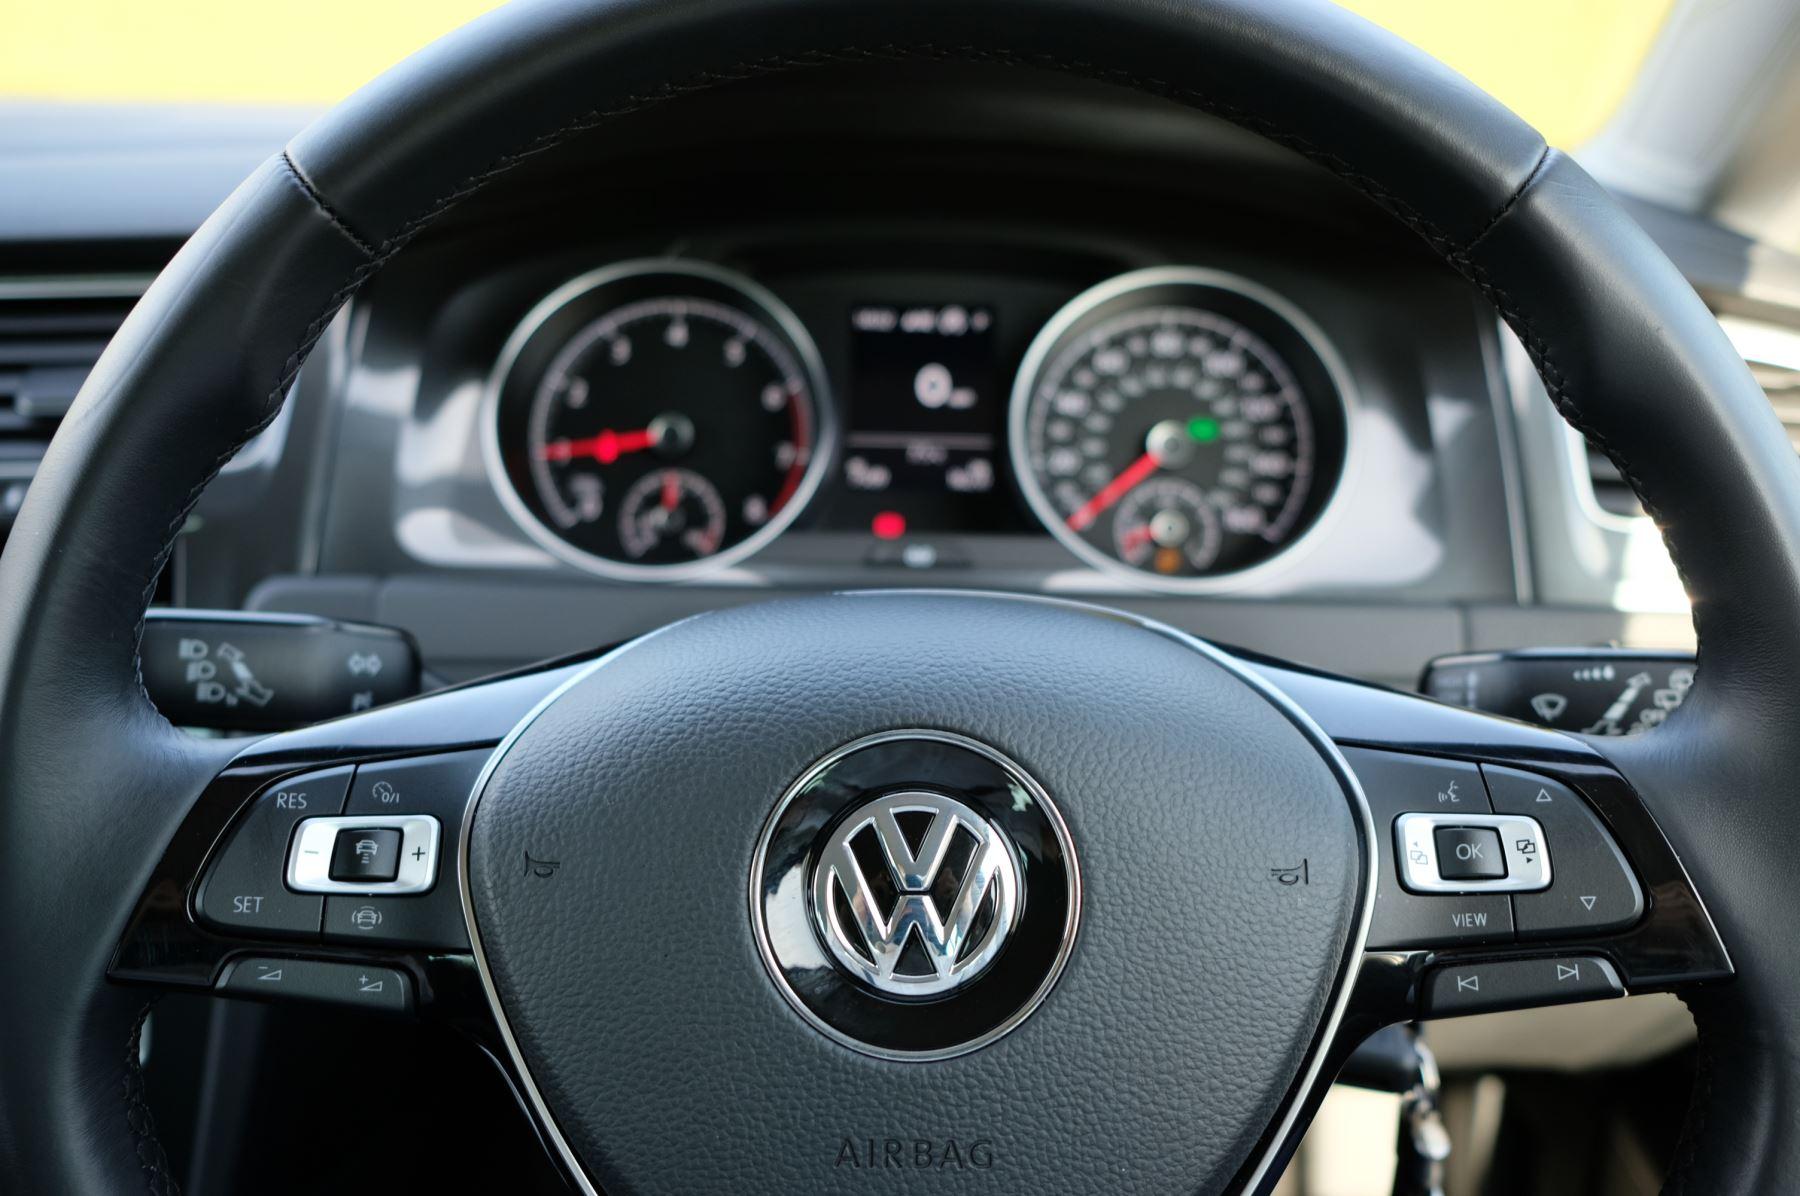 Volkswagen Golf 1.5 TSI EVO 150hp Match 5 Door DSG Auto with A/Con, Sat Nav, Alloys & Adaptive Cruise  image 16